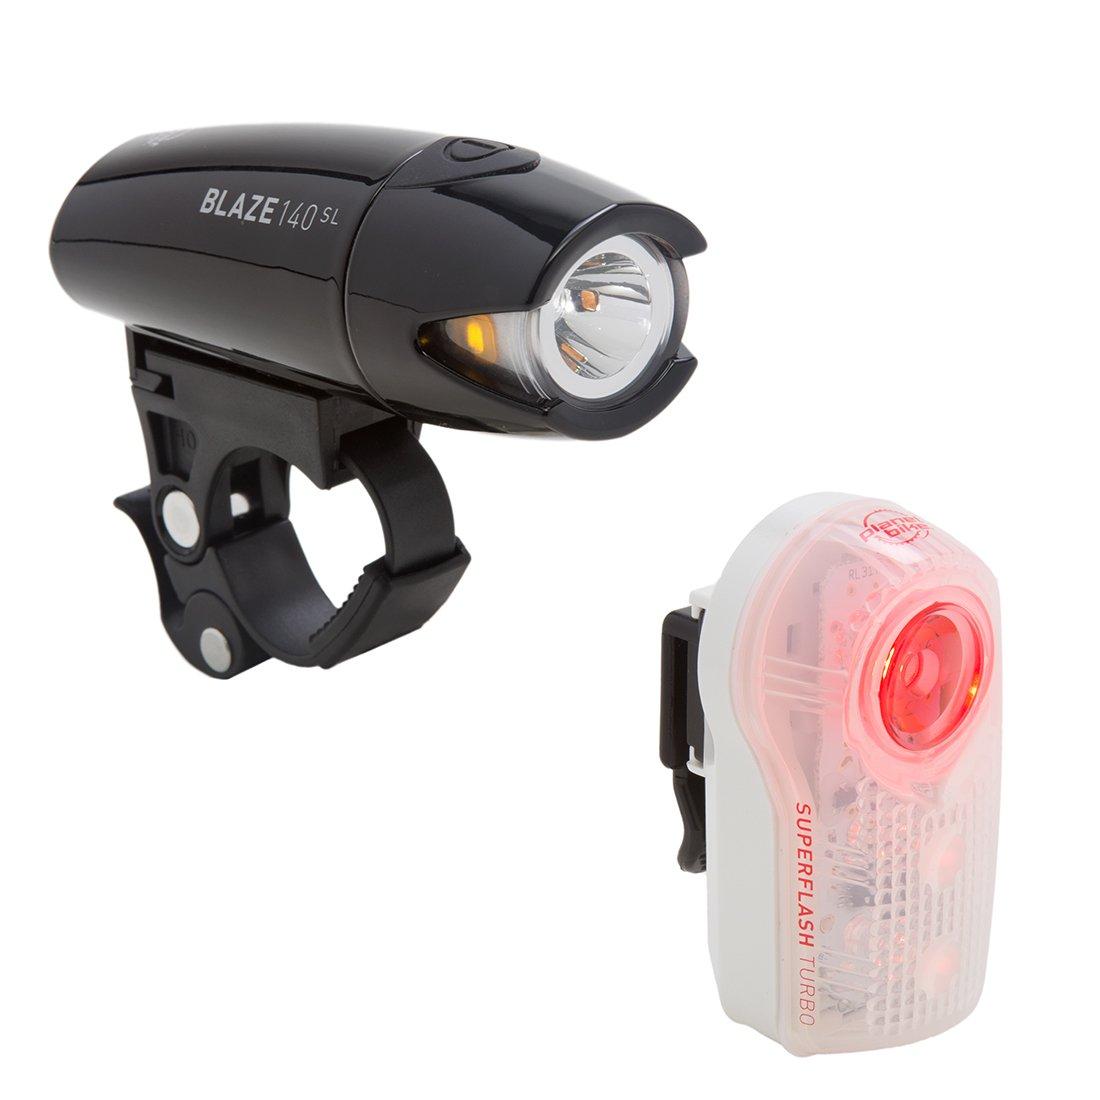 Planet Bike Blaze 140 SL & Superflash Turbo bike light set